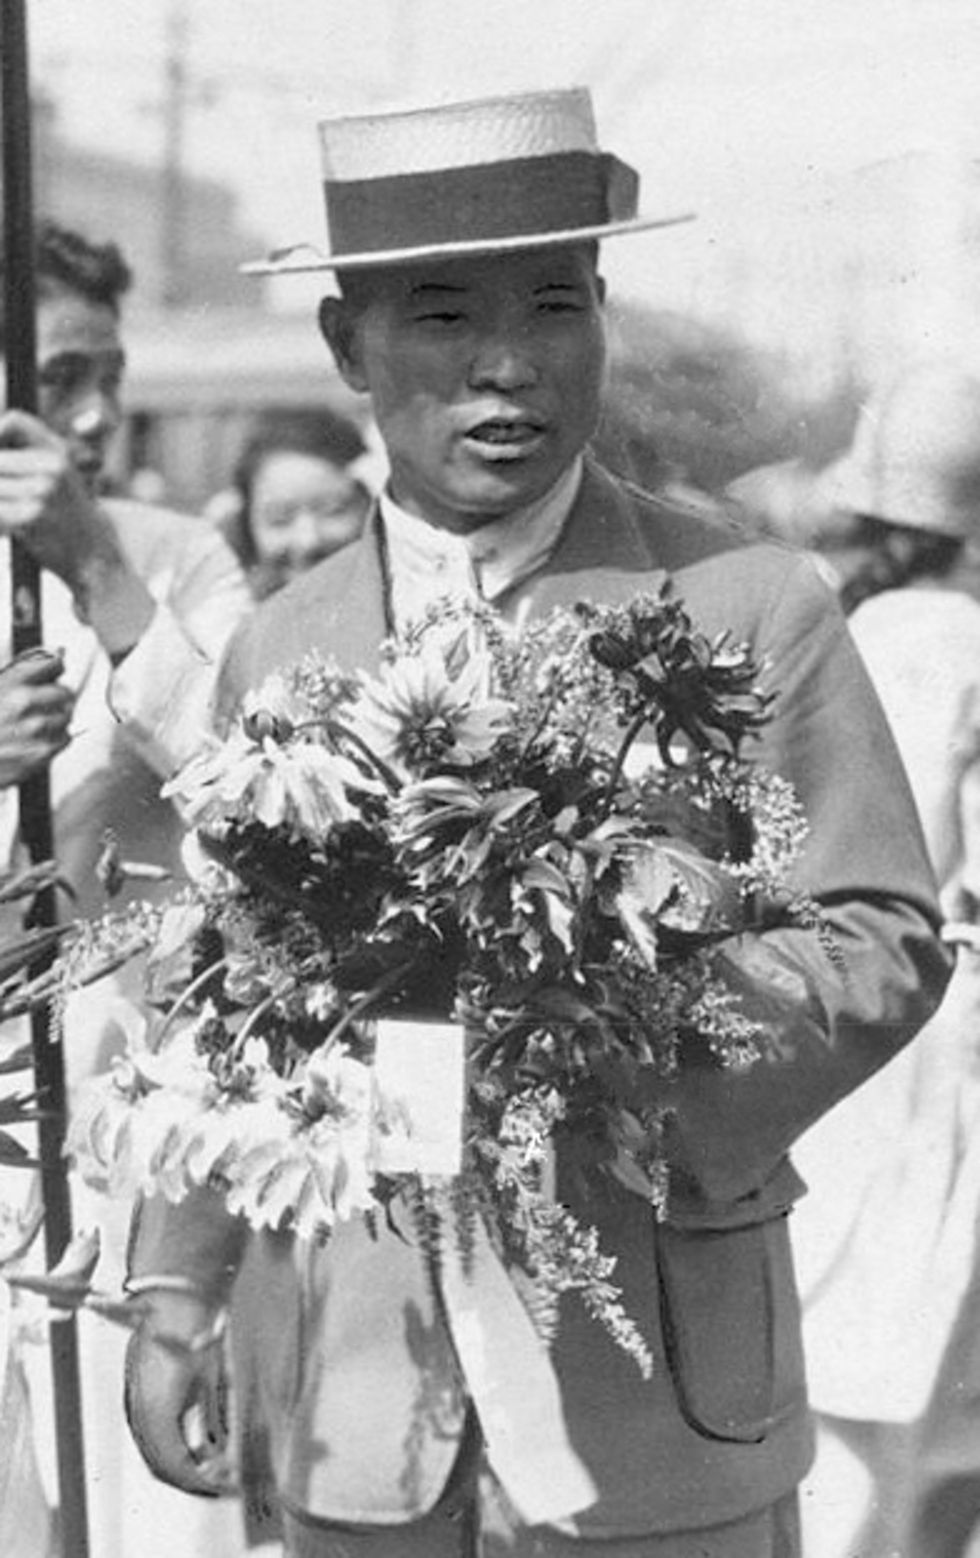 Shizo Kanakuri az 1924-es olimpia után (fotó: Wikipedia)